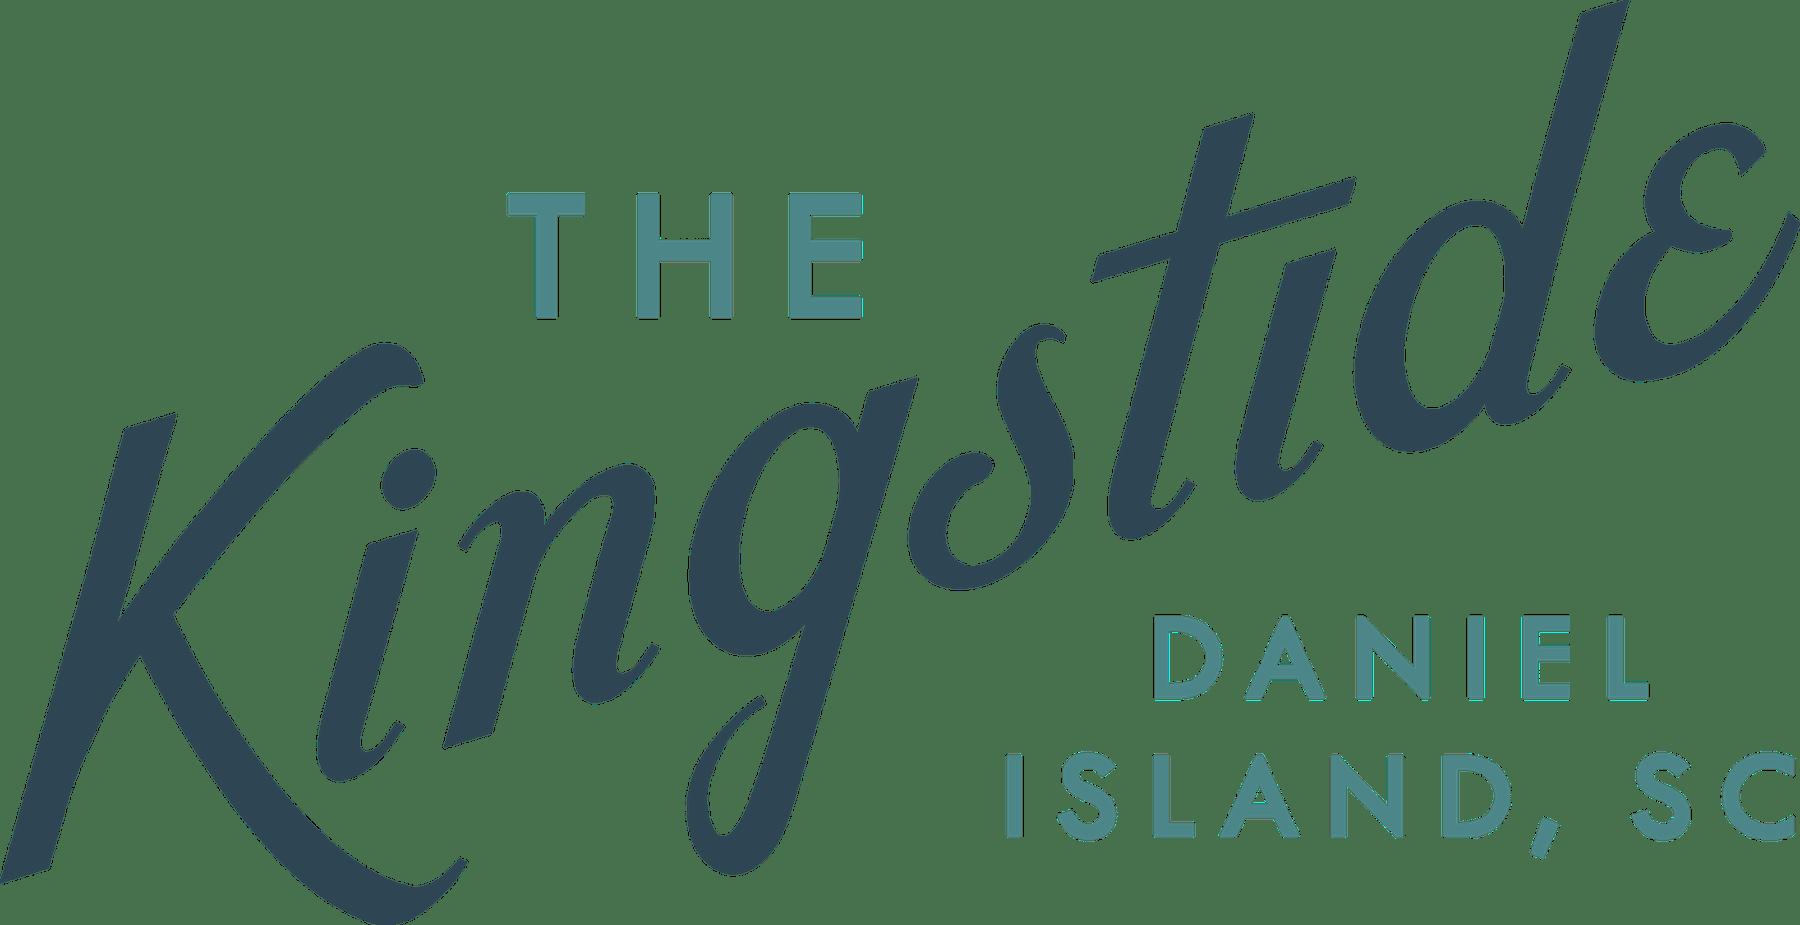 The Kingstide Home